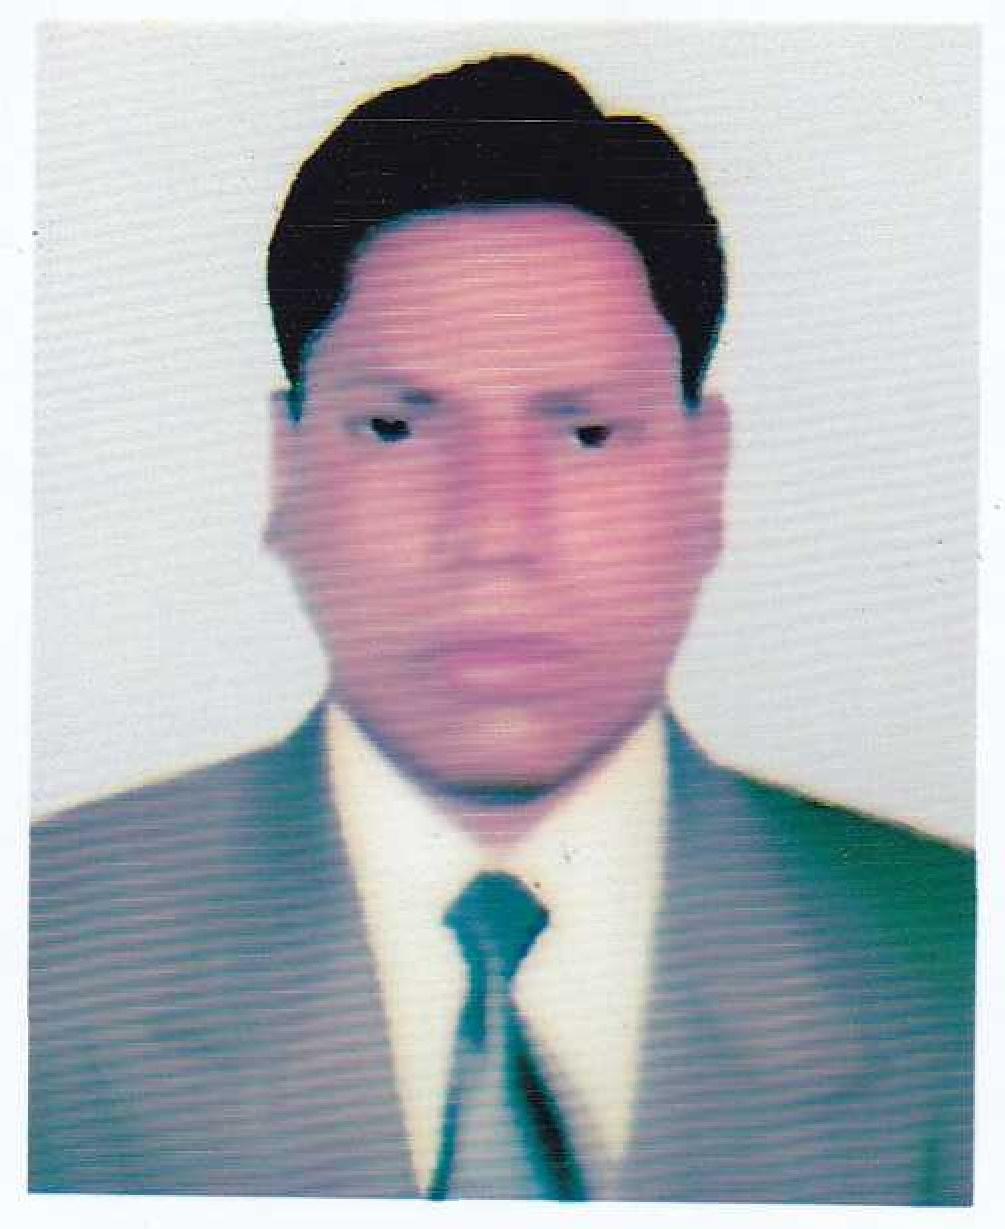 eftekhar ruhul_001 - Copy